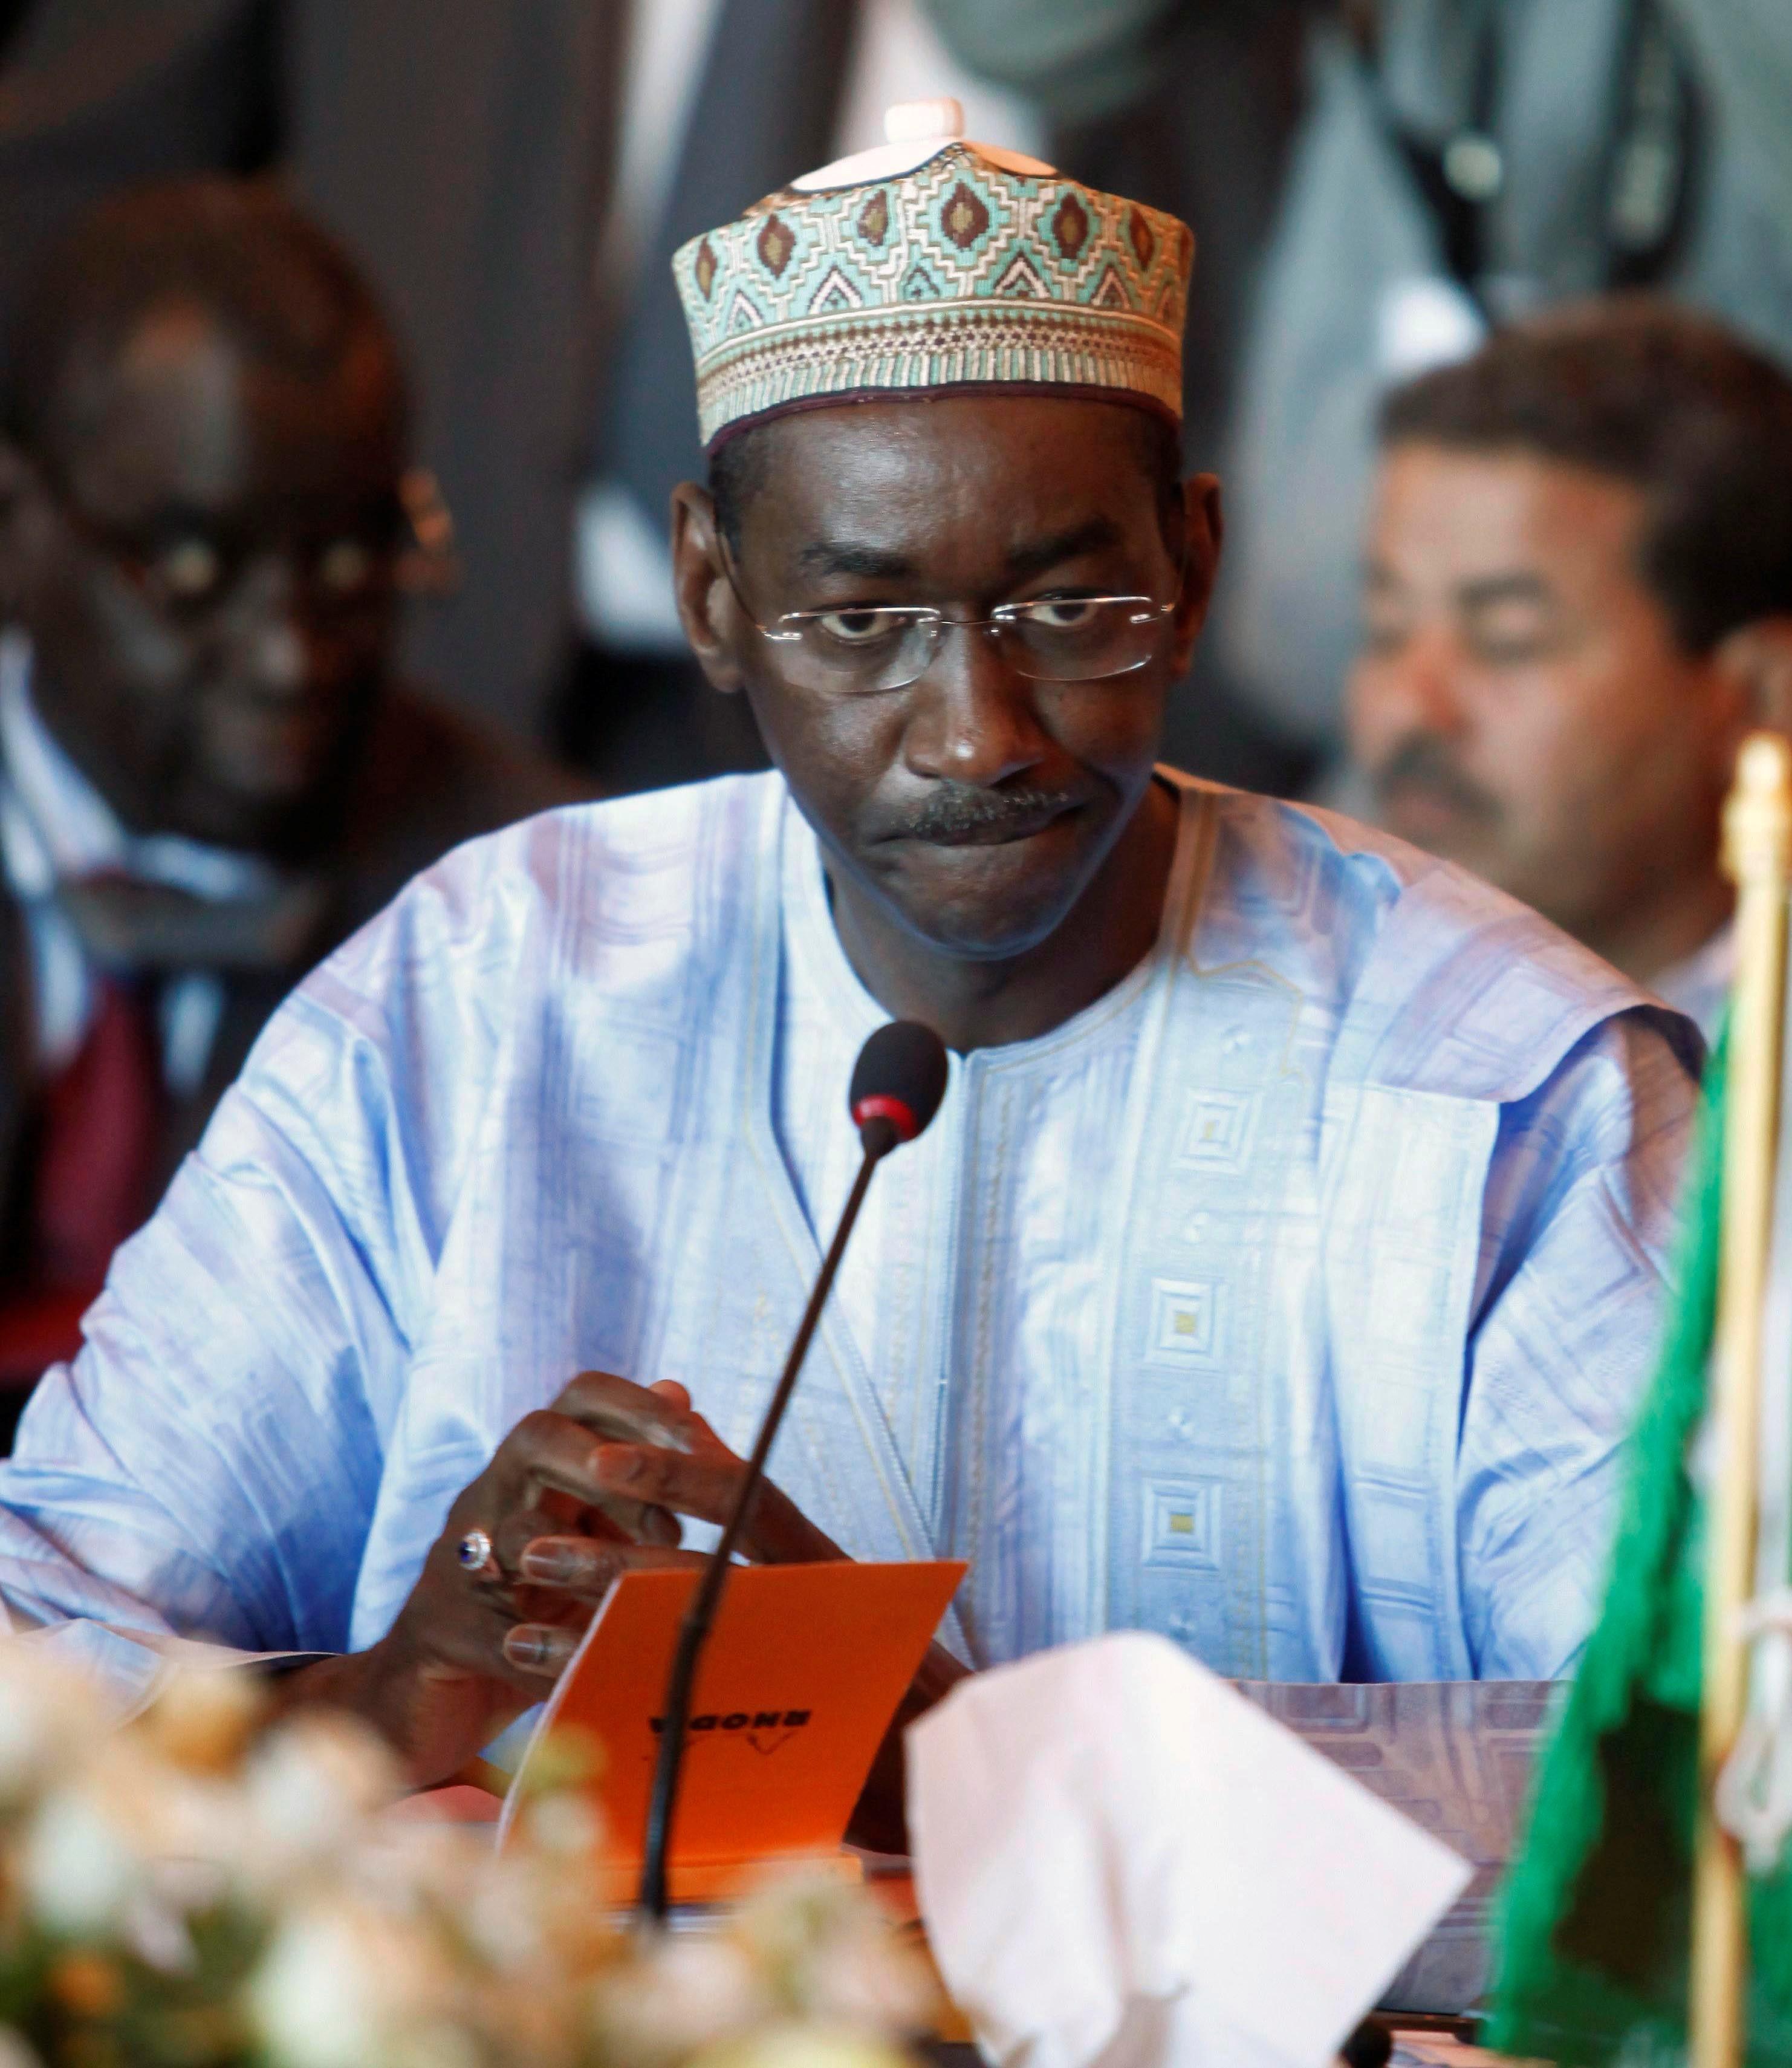 Presidente do Mali nomeia diplomata como primeiro-ministro interino